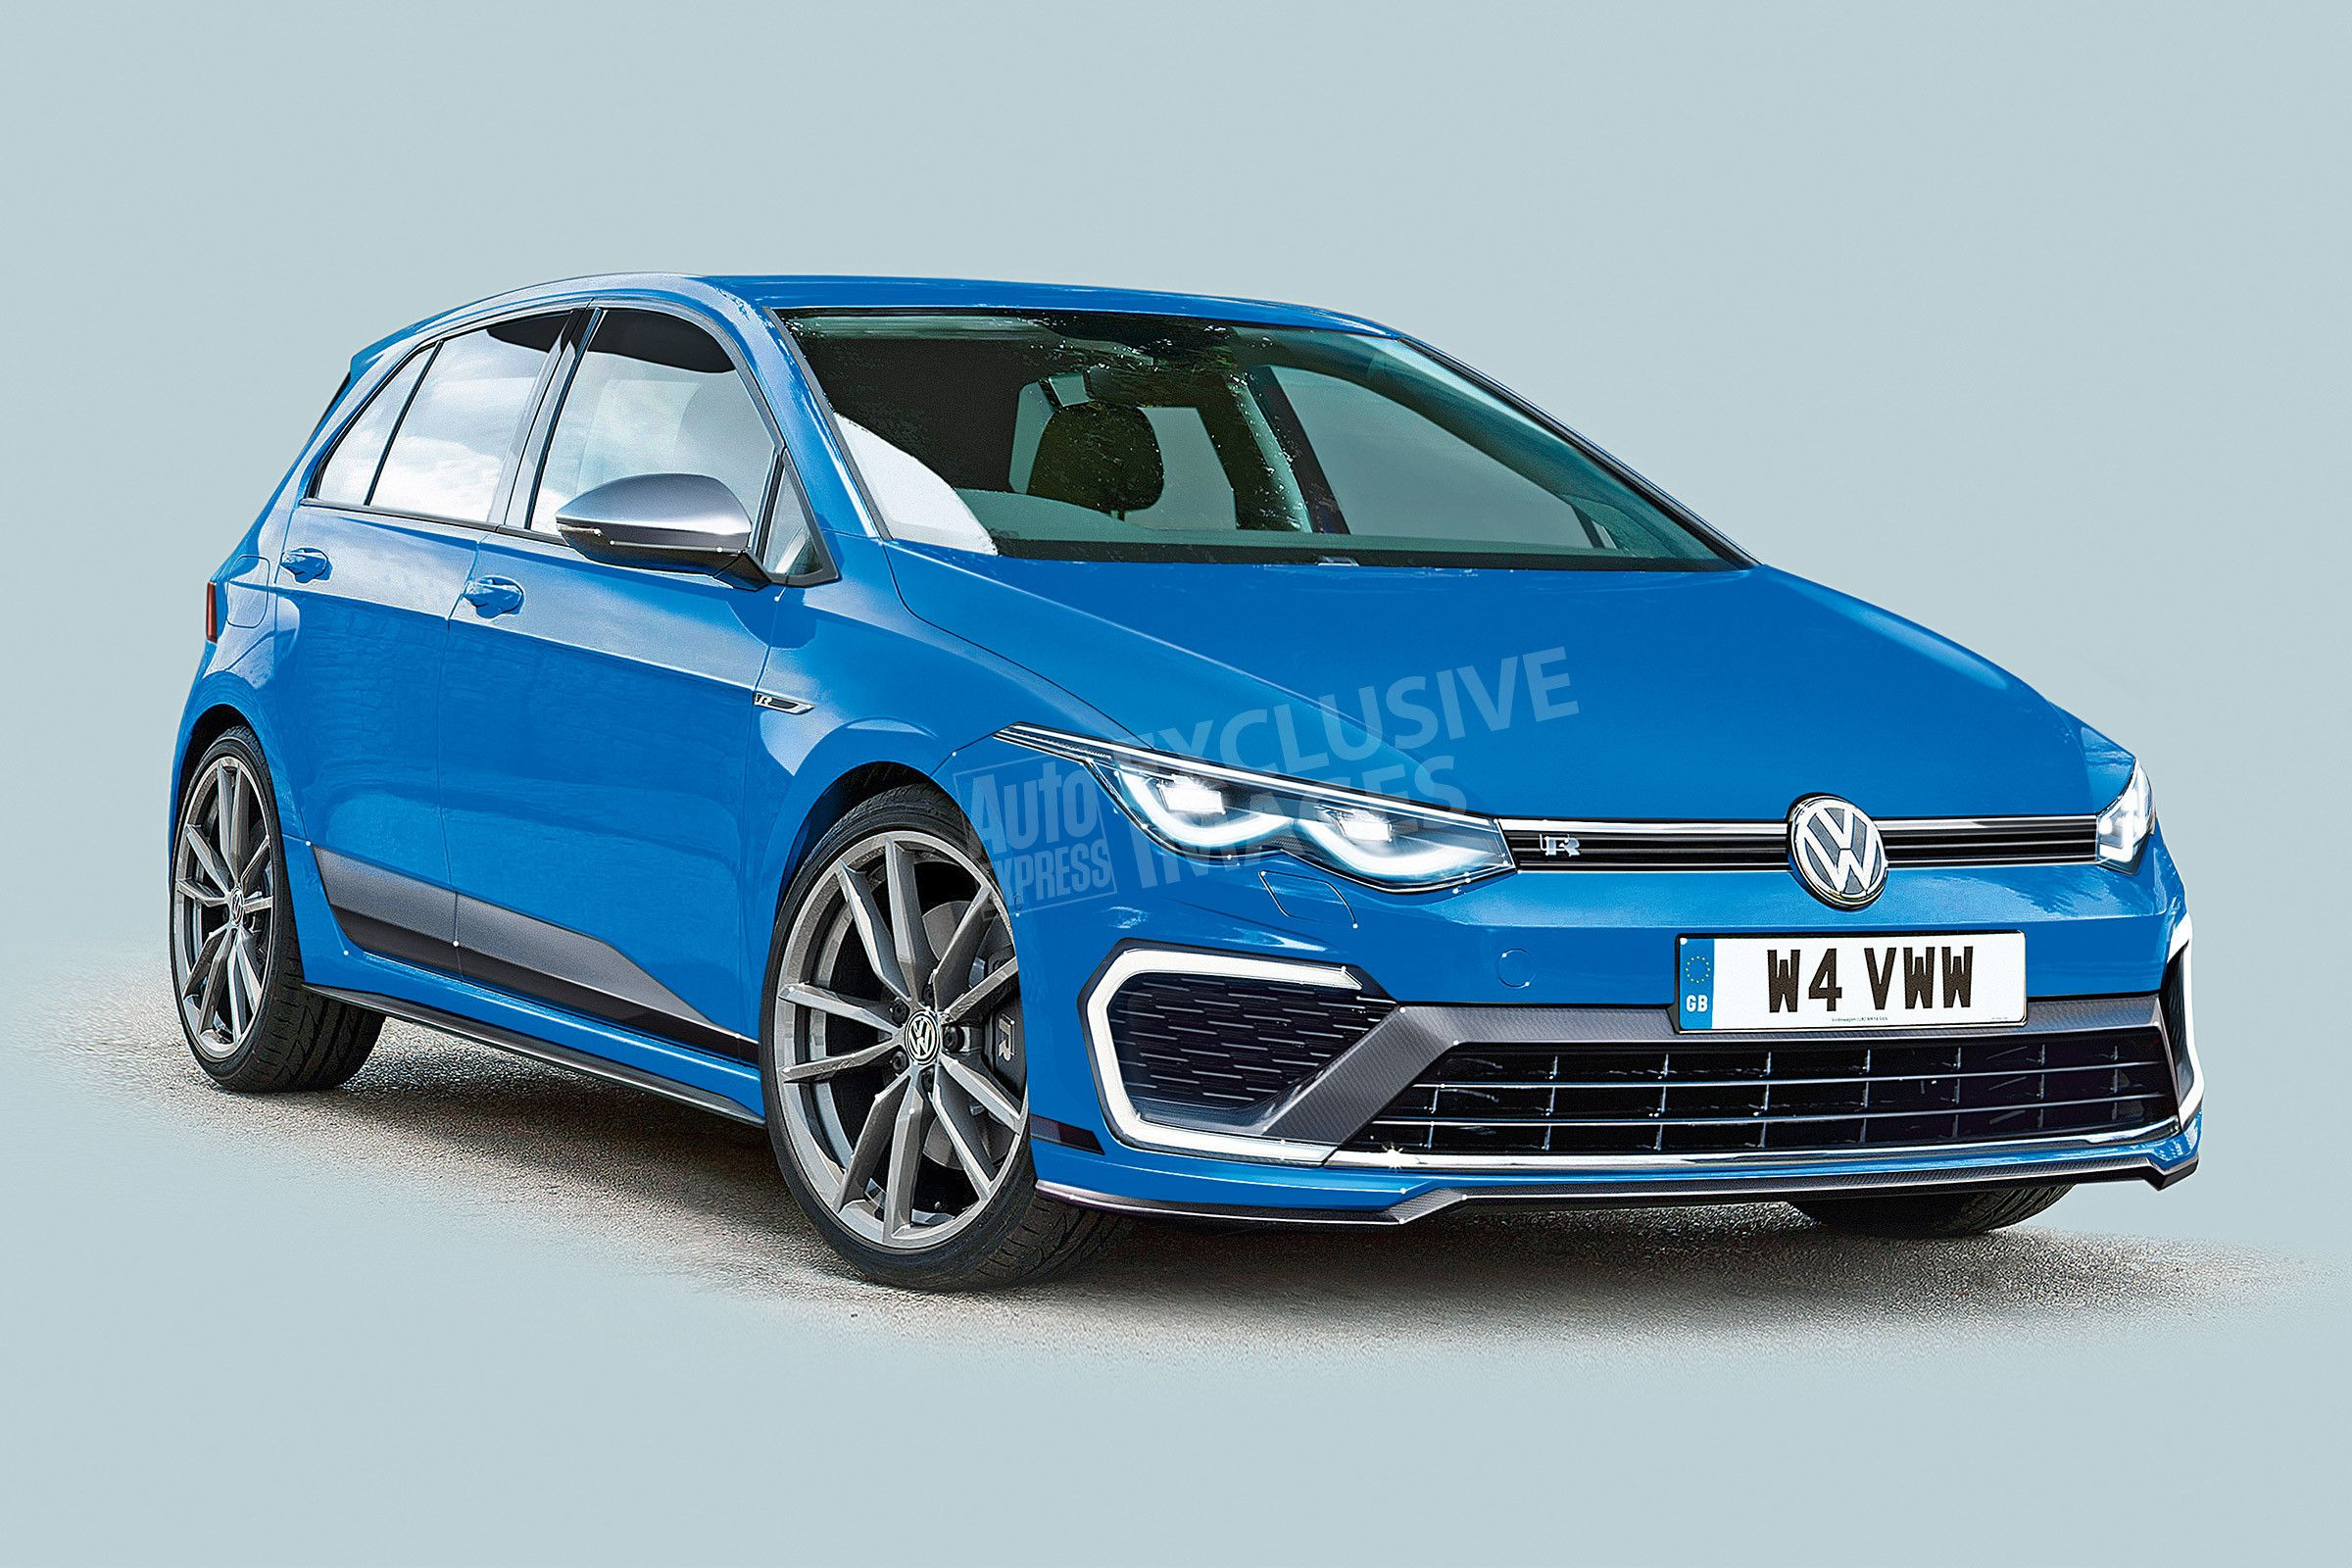 2020 Volkswagen Golf R New Volkswagen Golf Gtd Facelift 2017 Review Volkswagen Golf R Volkswagen Golf Volkswagen Gti